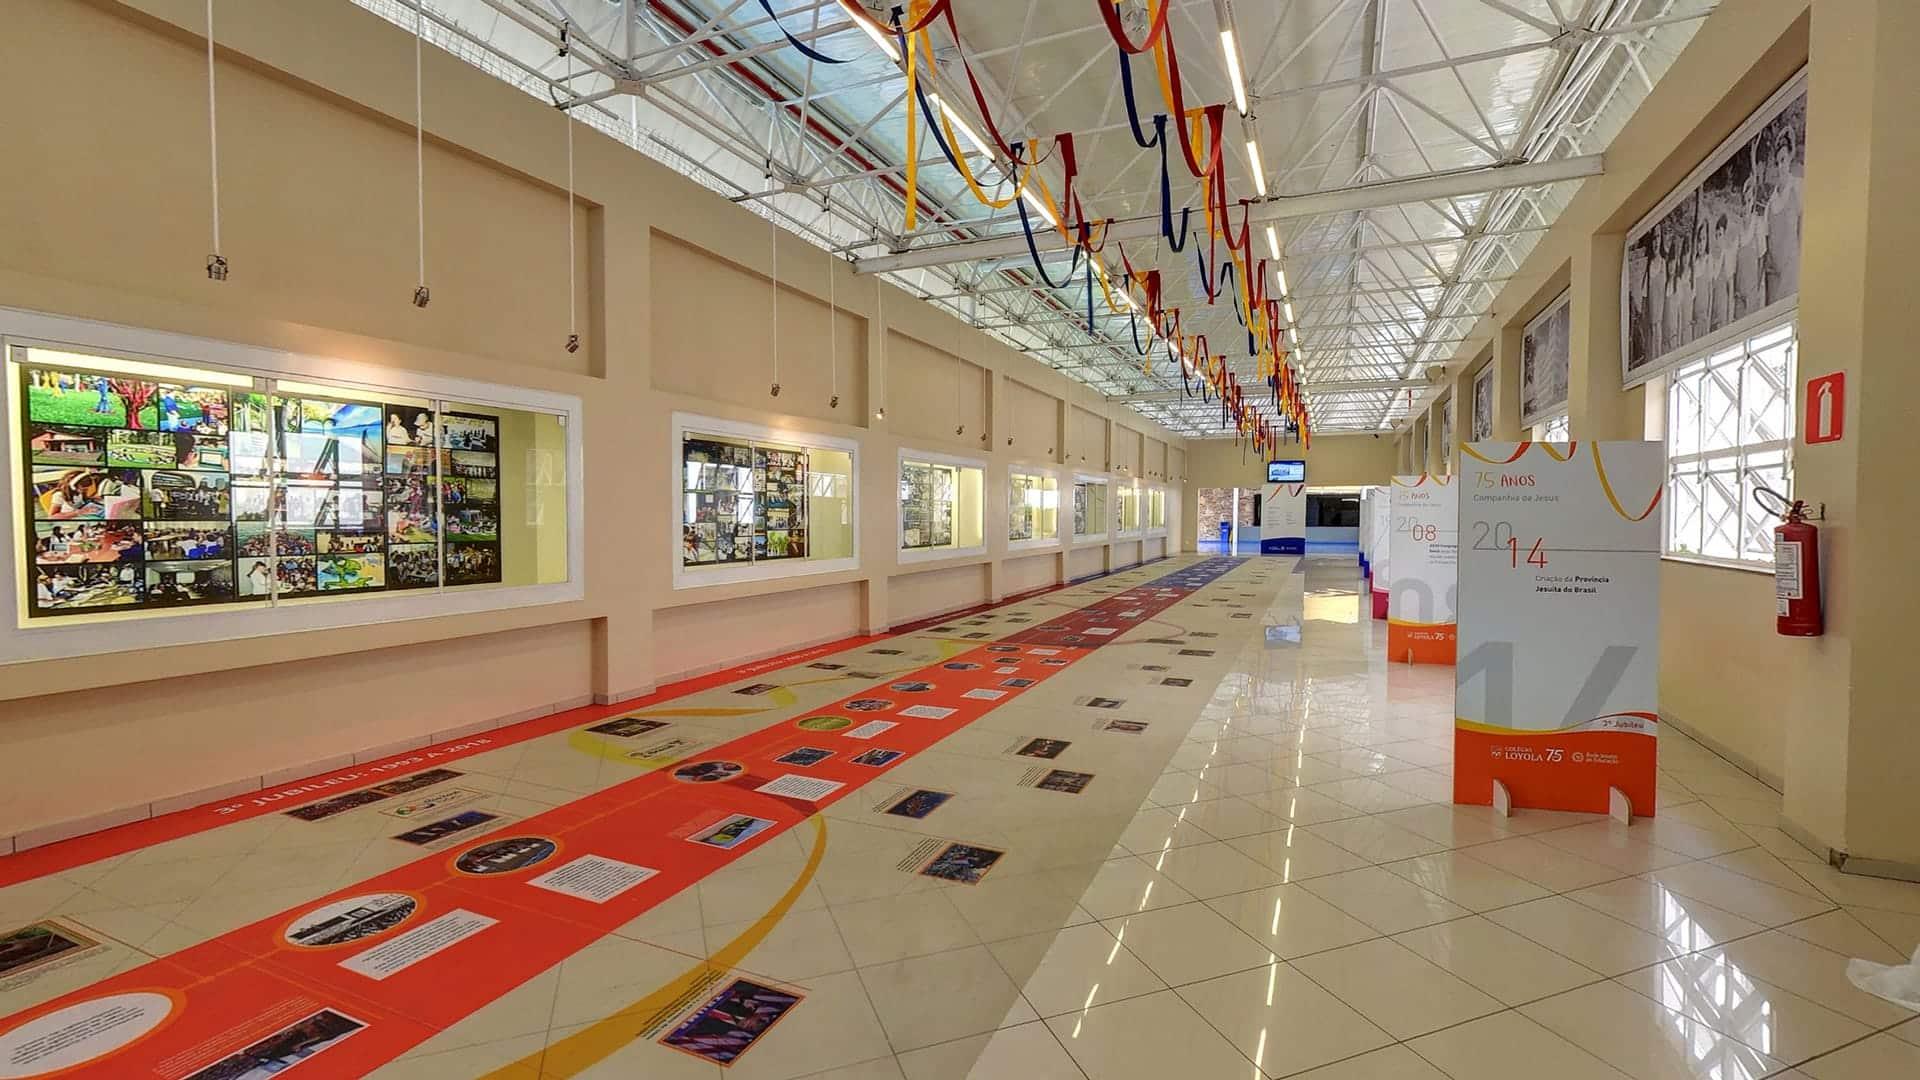 Exposição 75 anos - Colégio Loyola - Tour Virtual Street View Trusted